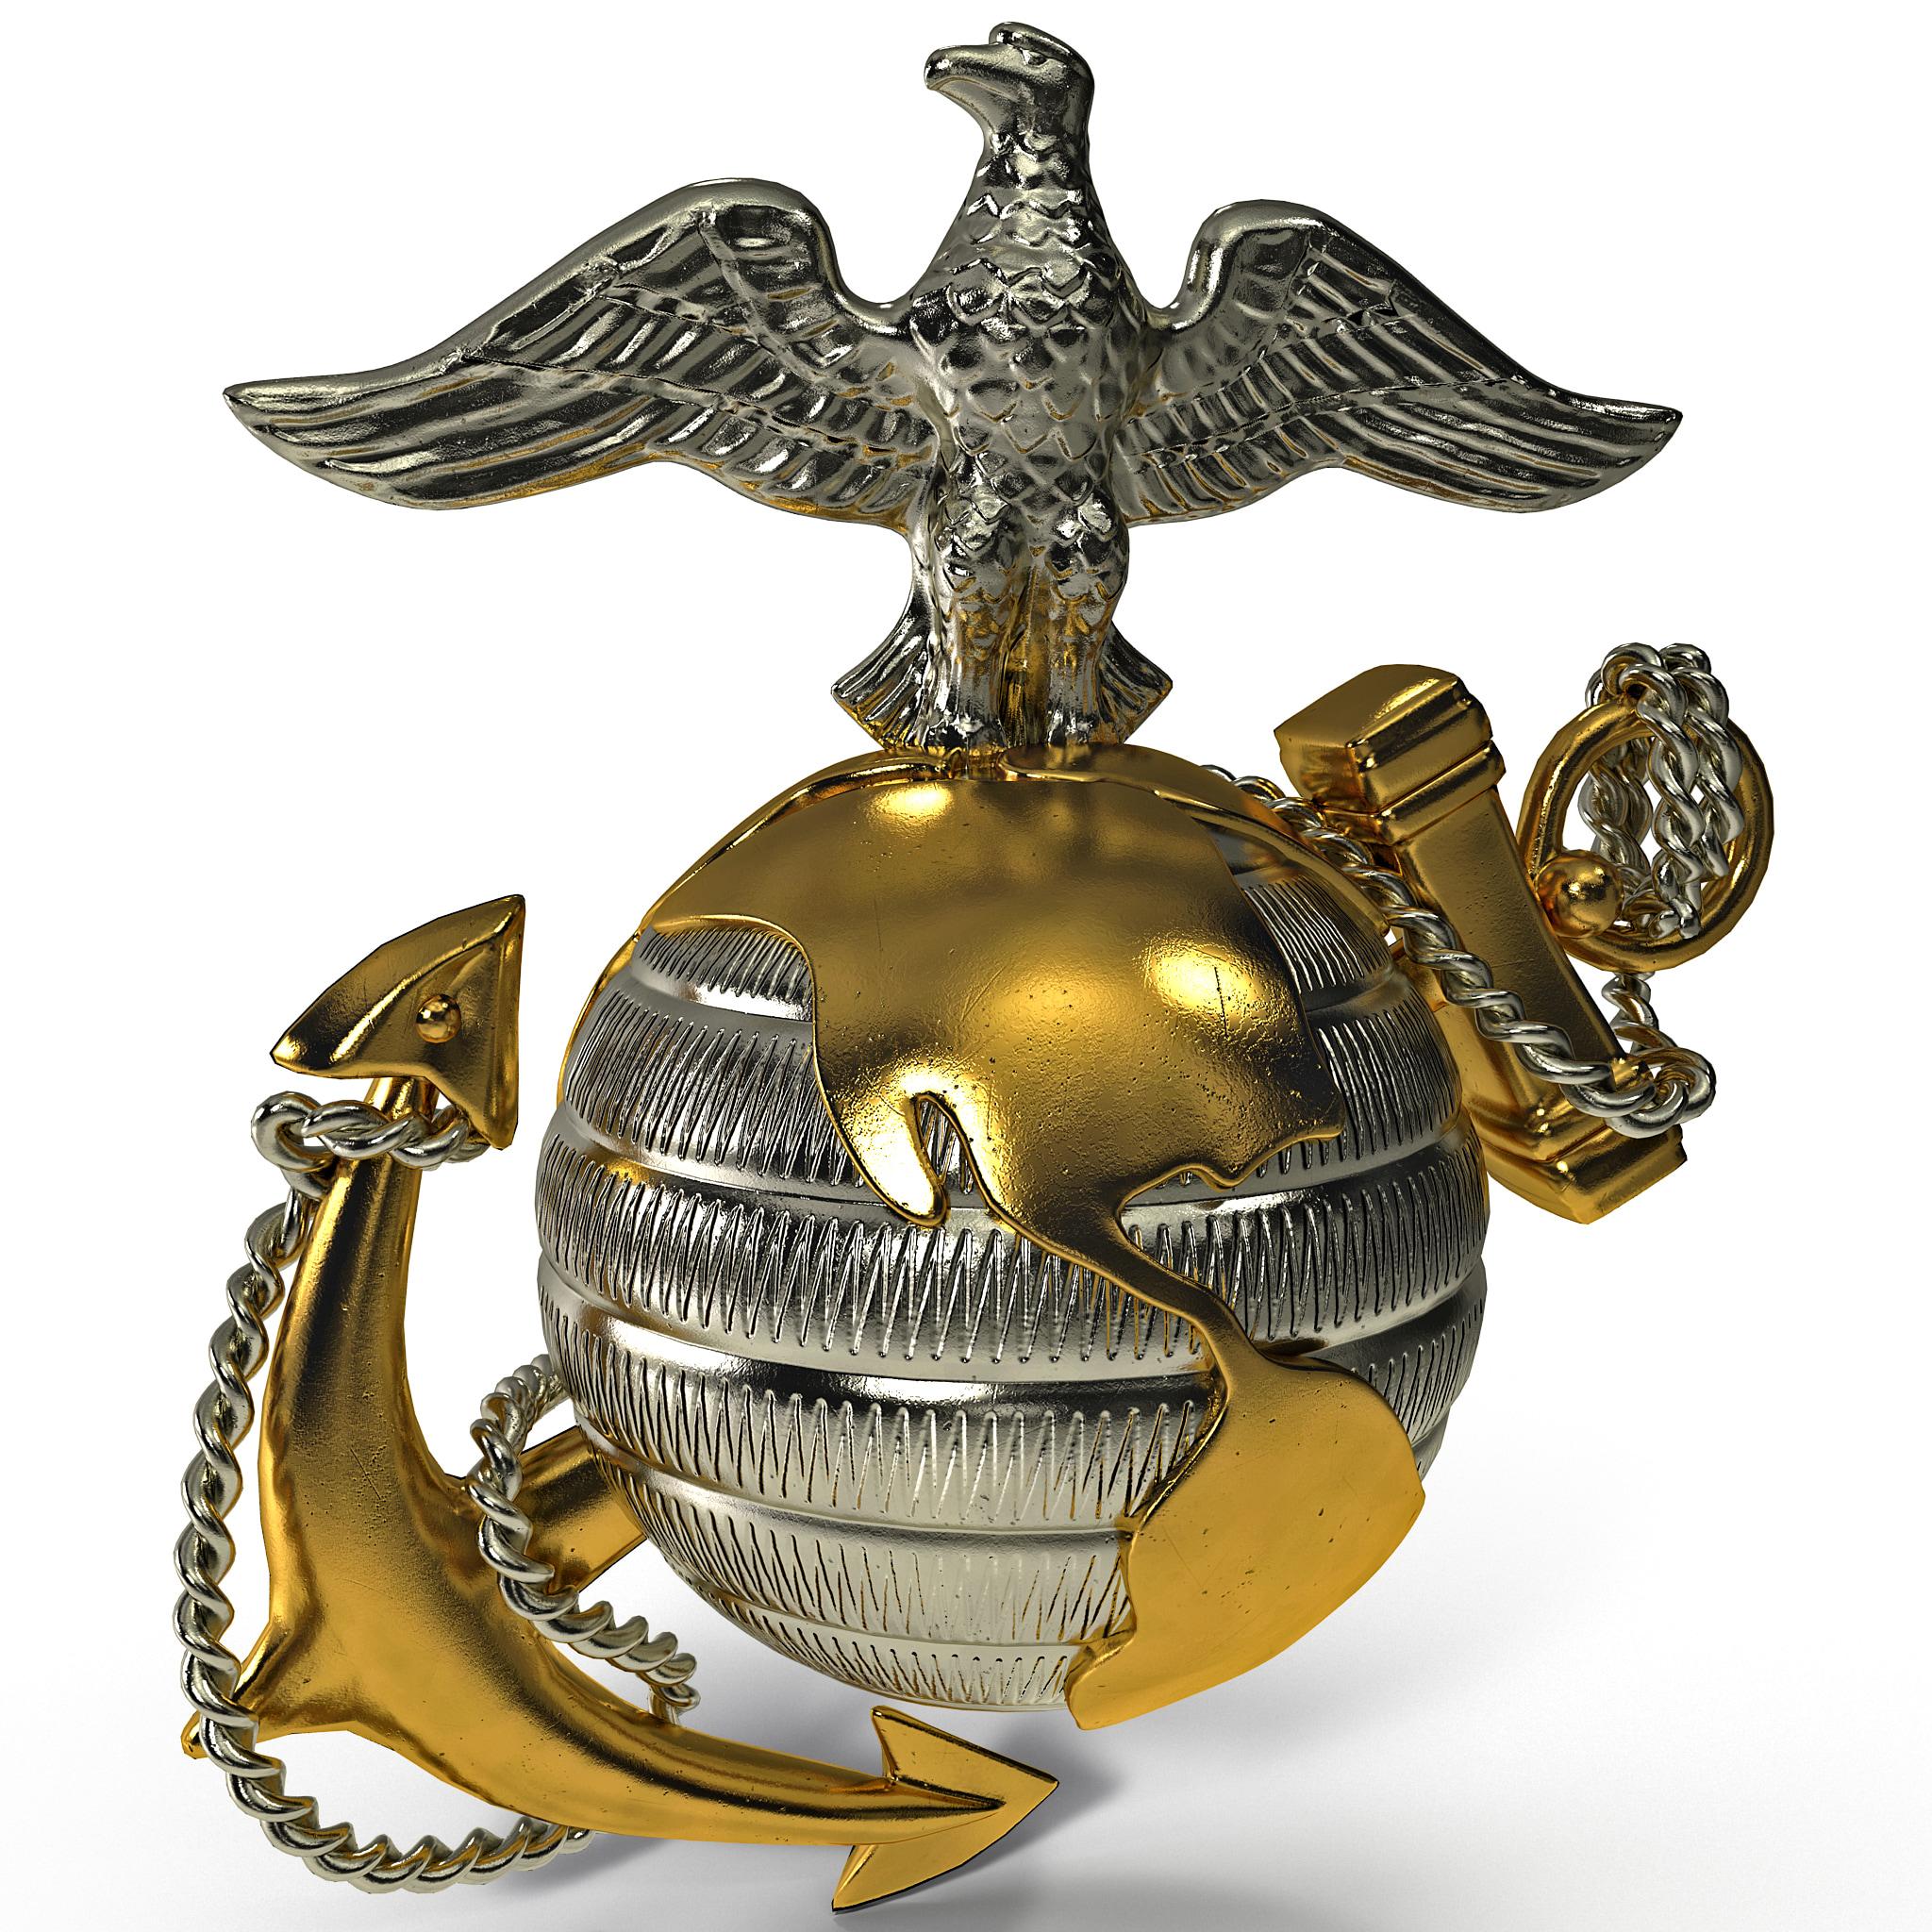 USMC Emblem_2.jpg